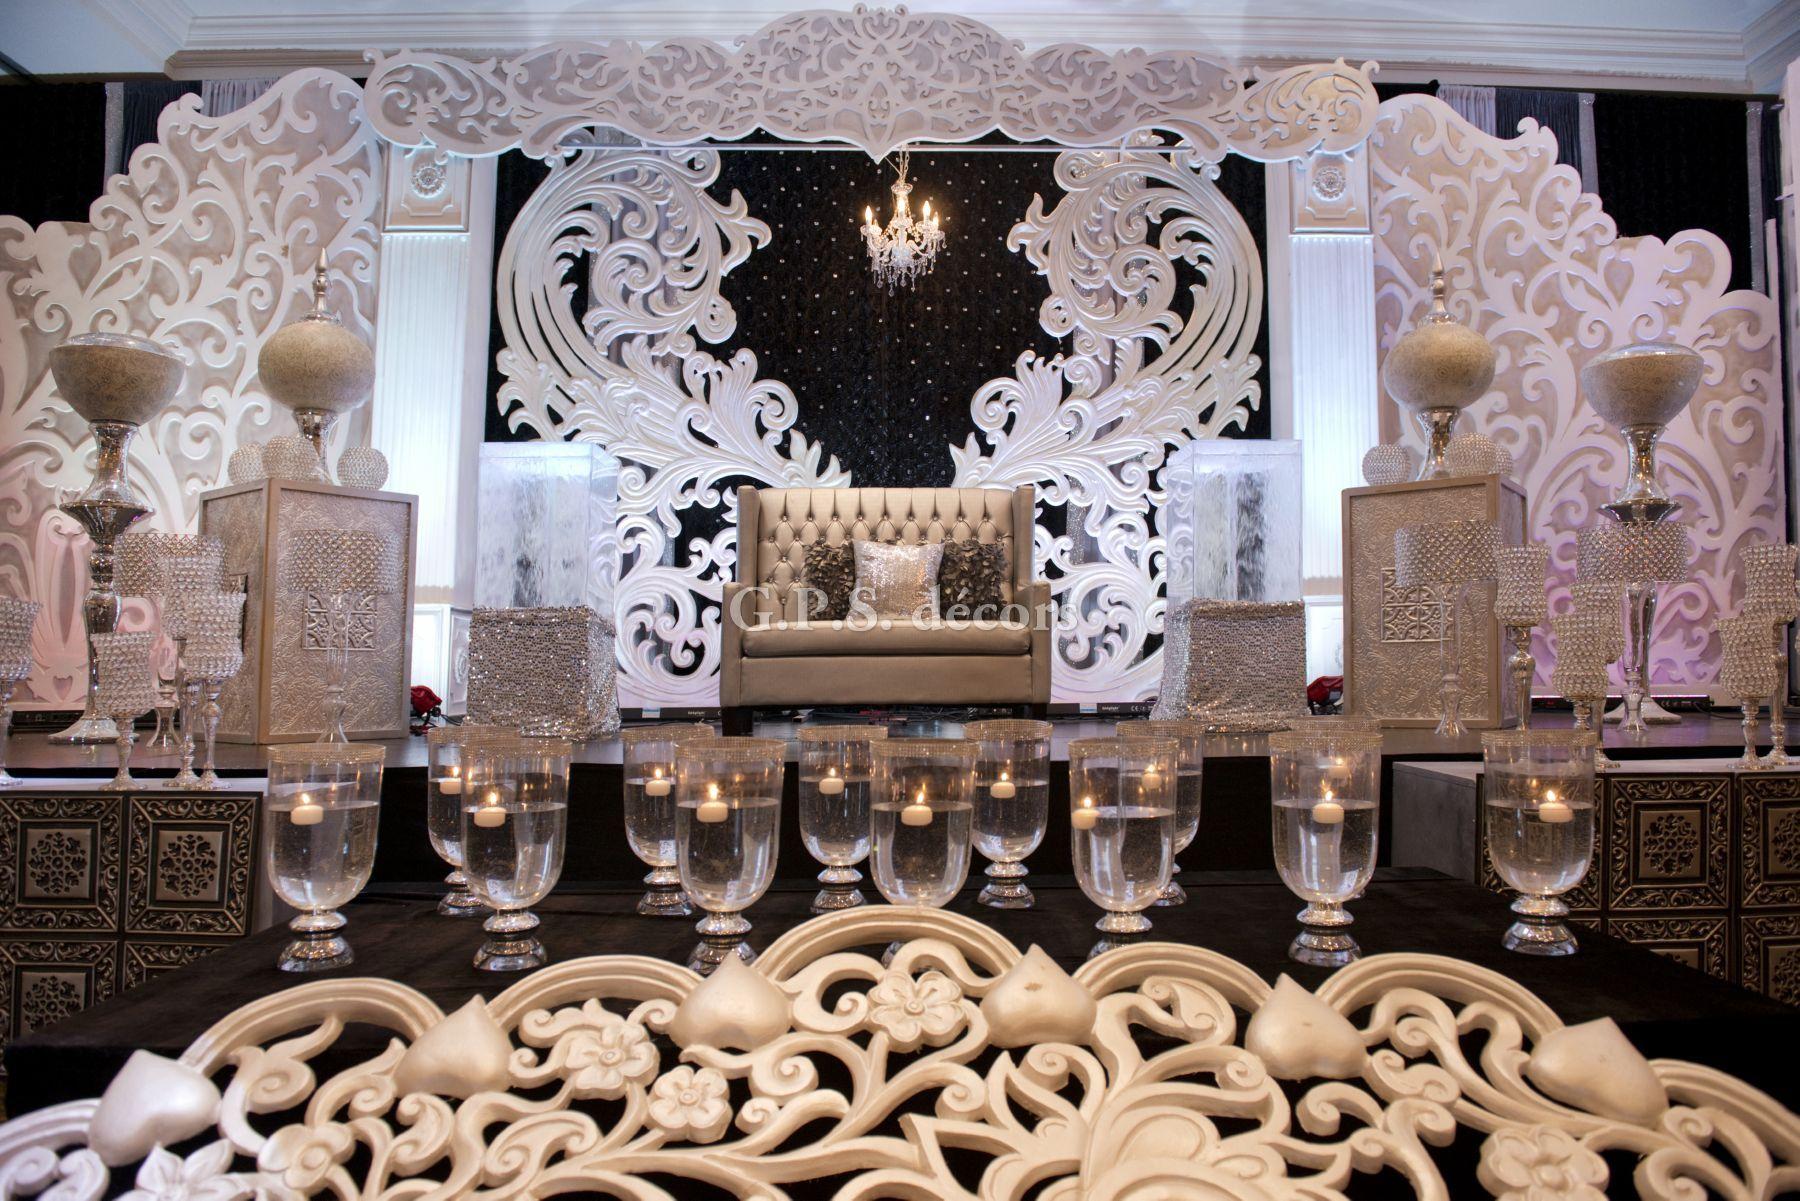 toronto wedding decor receptions wow factor pinterest toronto and weddings. Black Bedroom Furniture Sets. Home Design Ideas